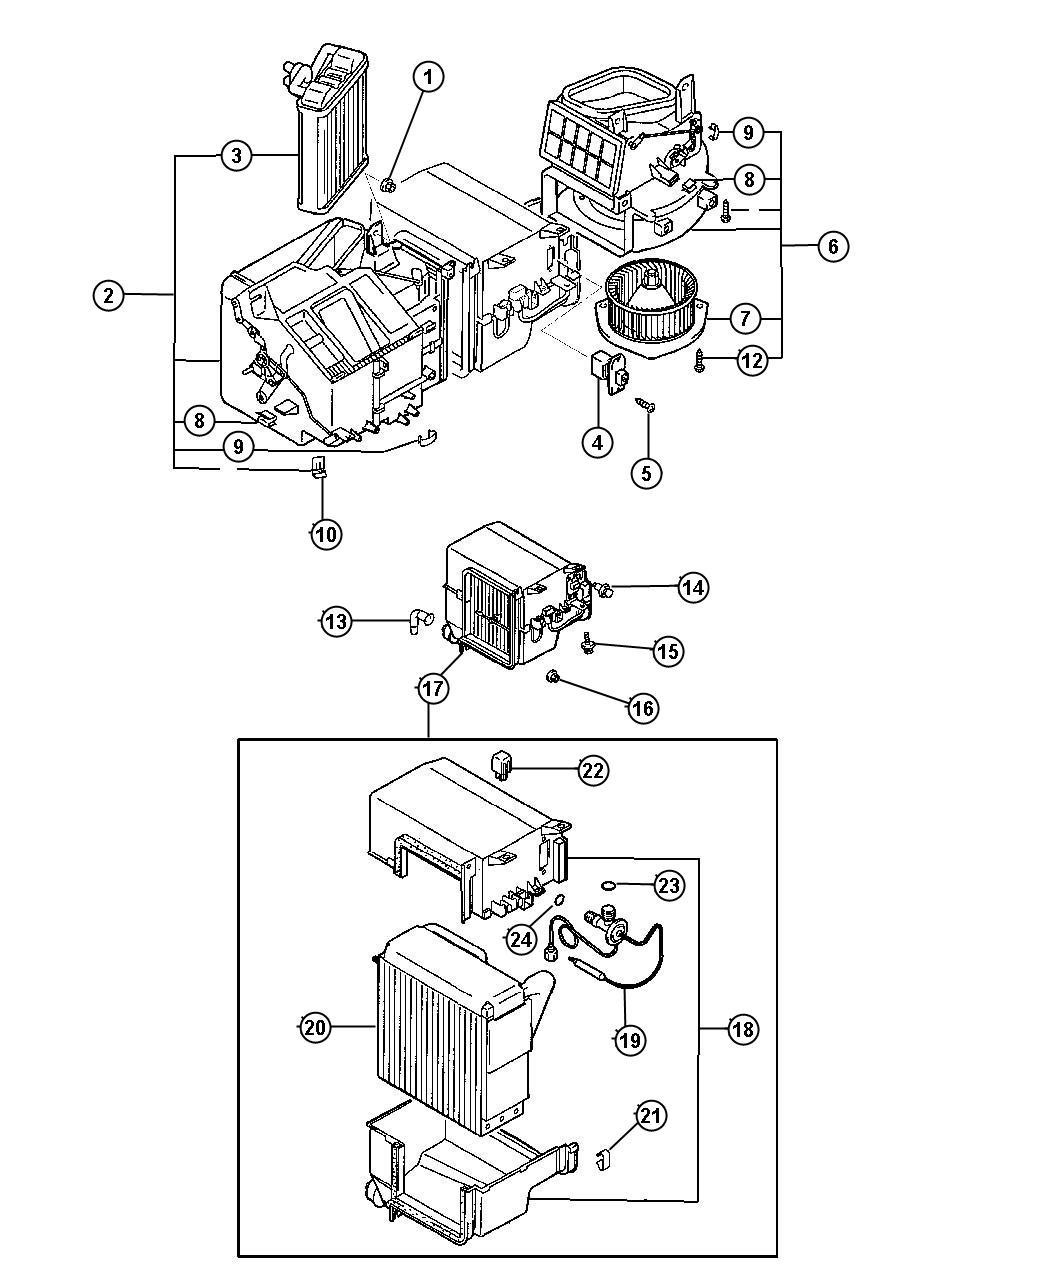 Jeep Grand Cherokee Evaporato Air Conditioning